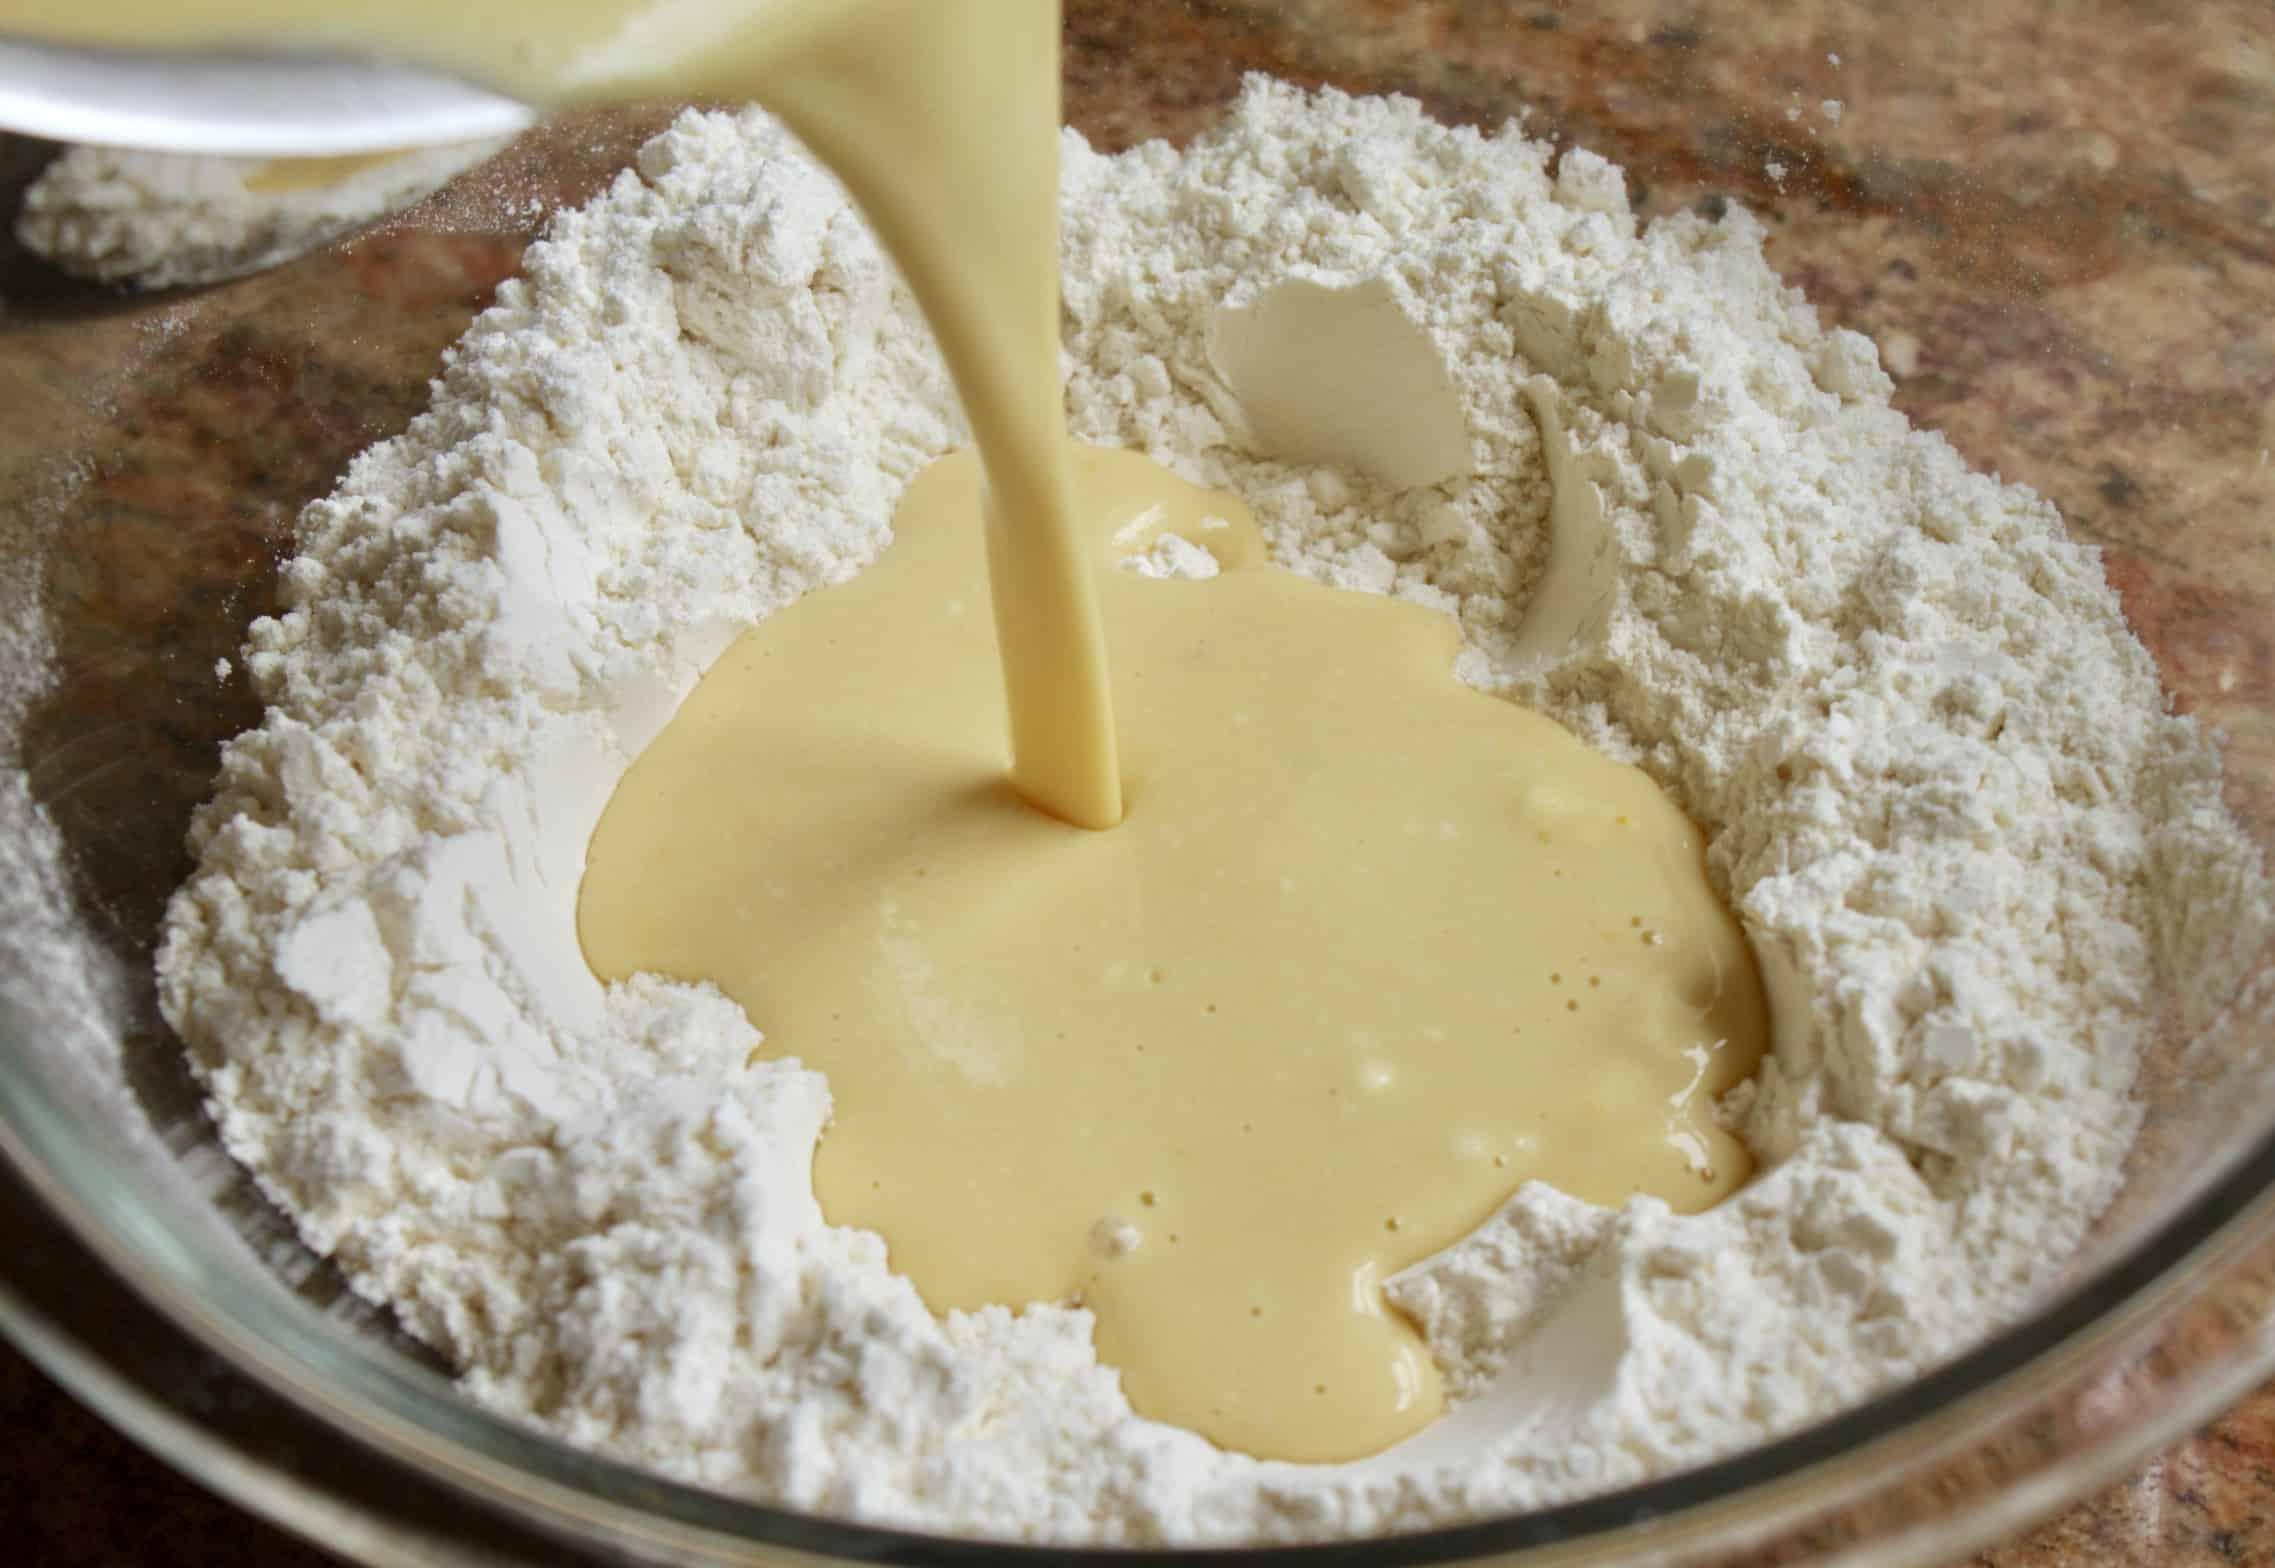 adding liquid to flour for pancakes